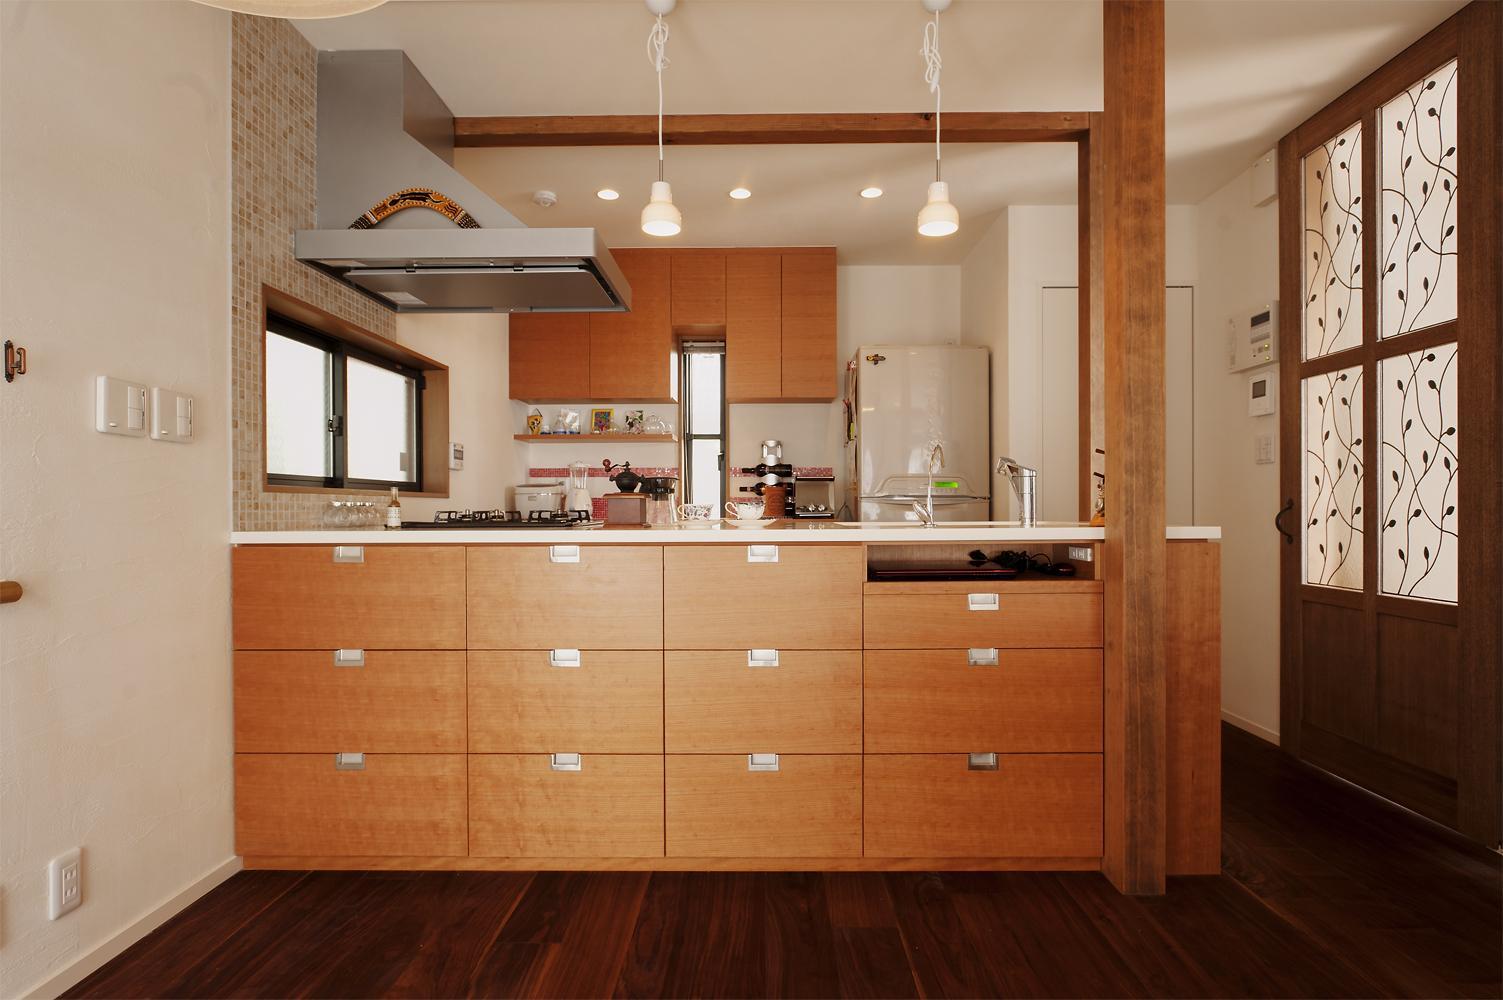 S邸・家族の笑顔がつながるオープンキッチンの部屋 オリジナルのオープンキッチン